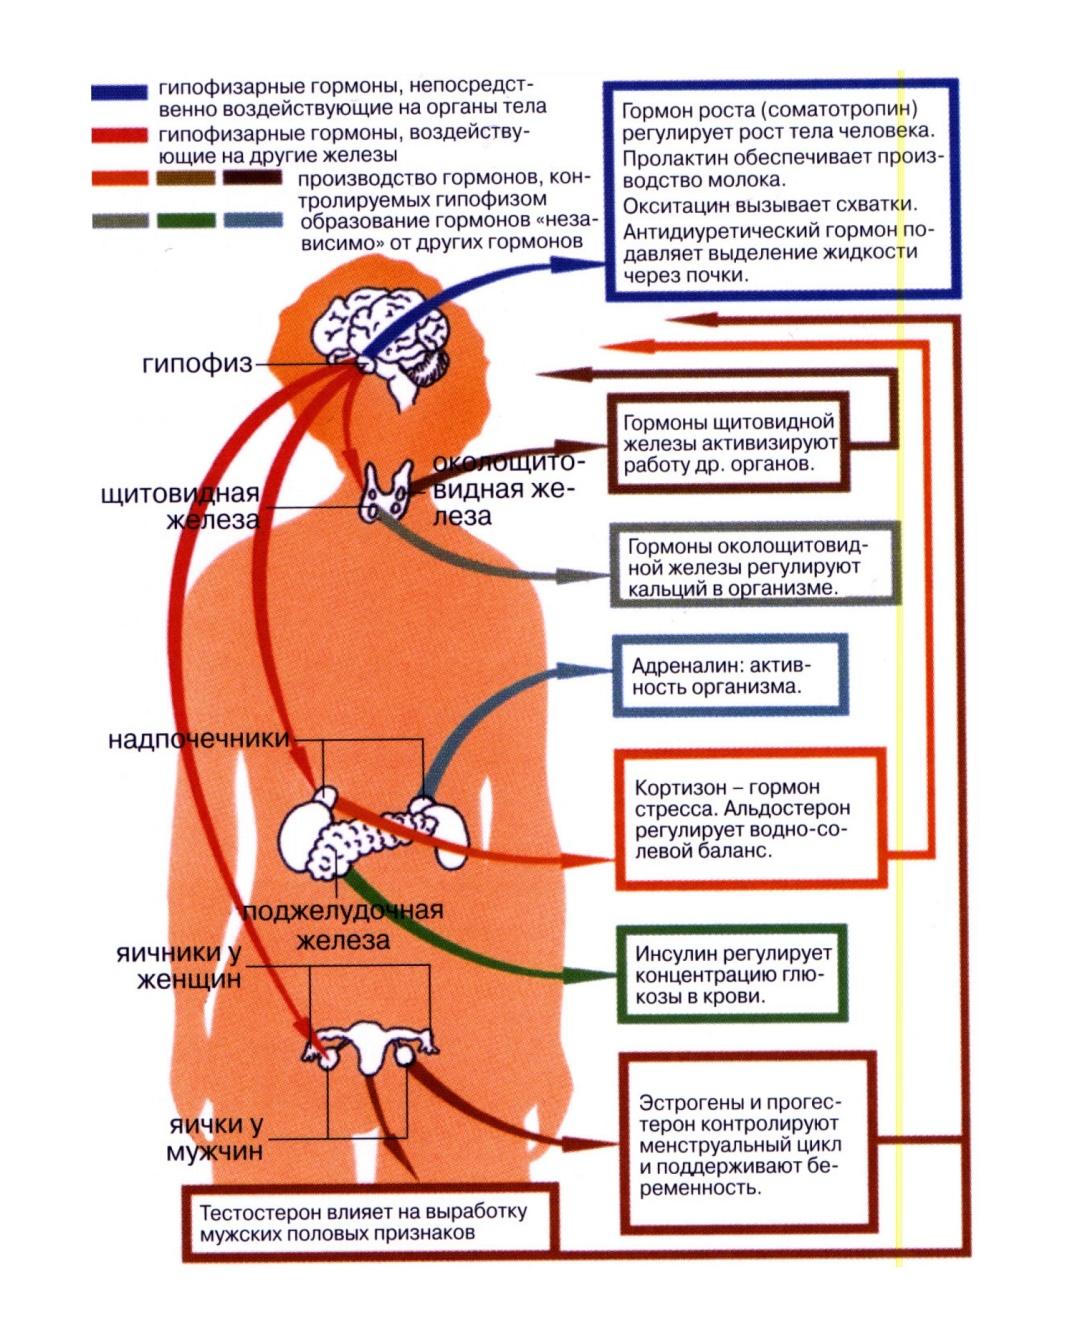 gormoni i emocii jeloveka